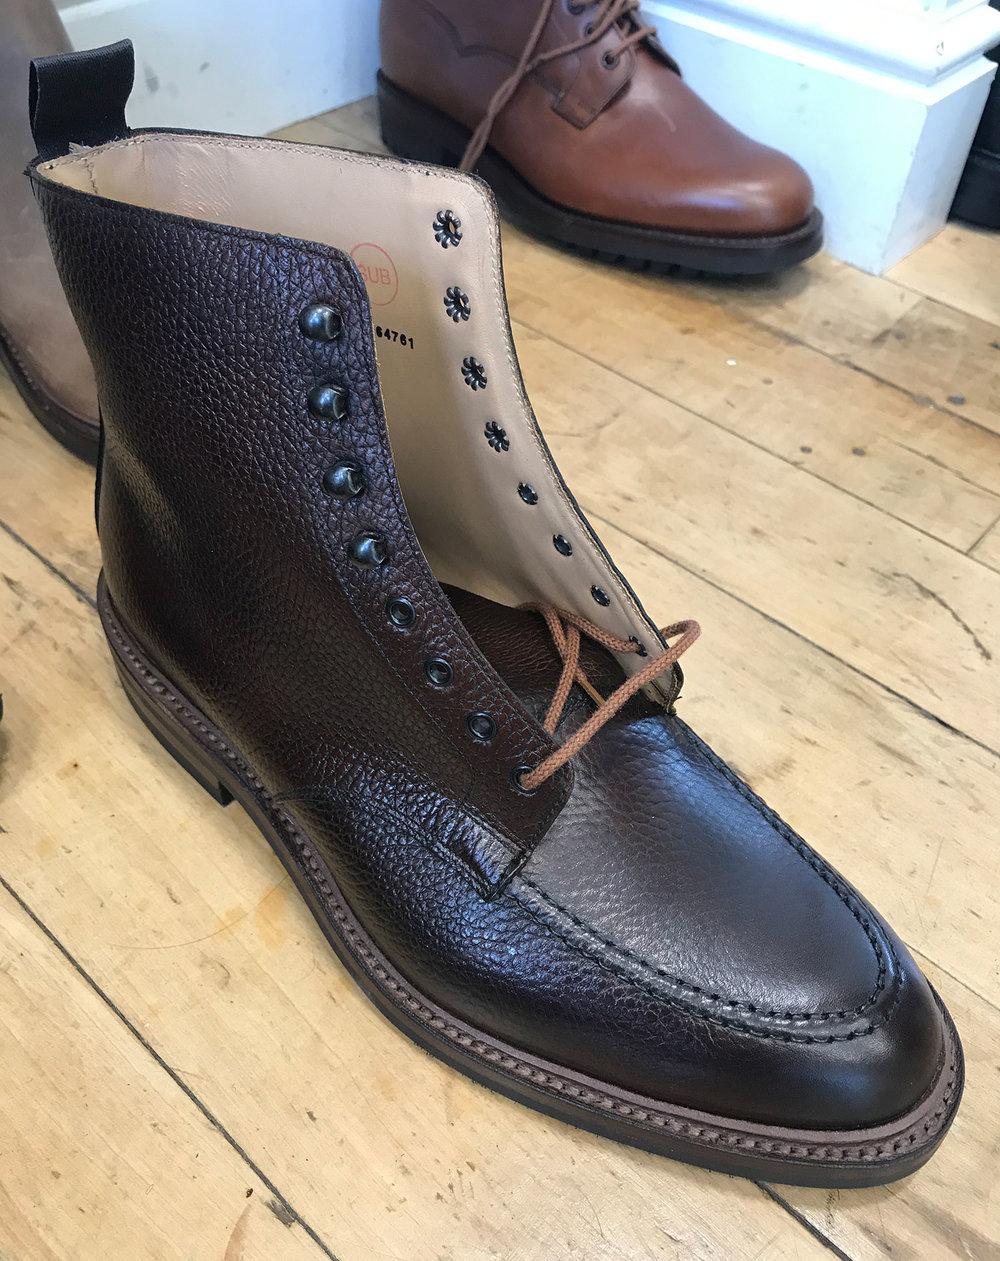 crockett-and-jones-Galway-black-scotch-grained-boots.jpg